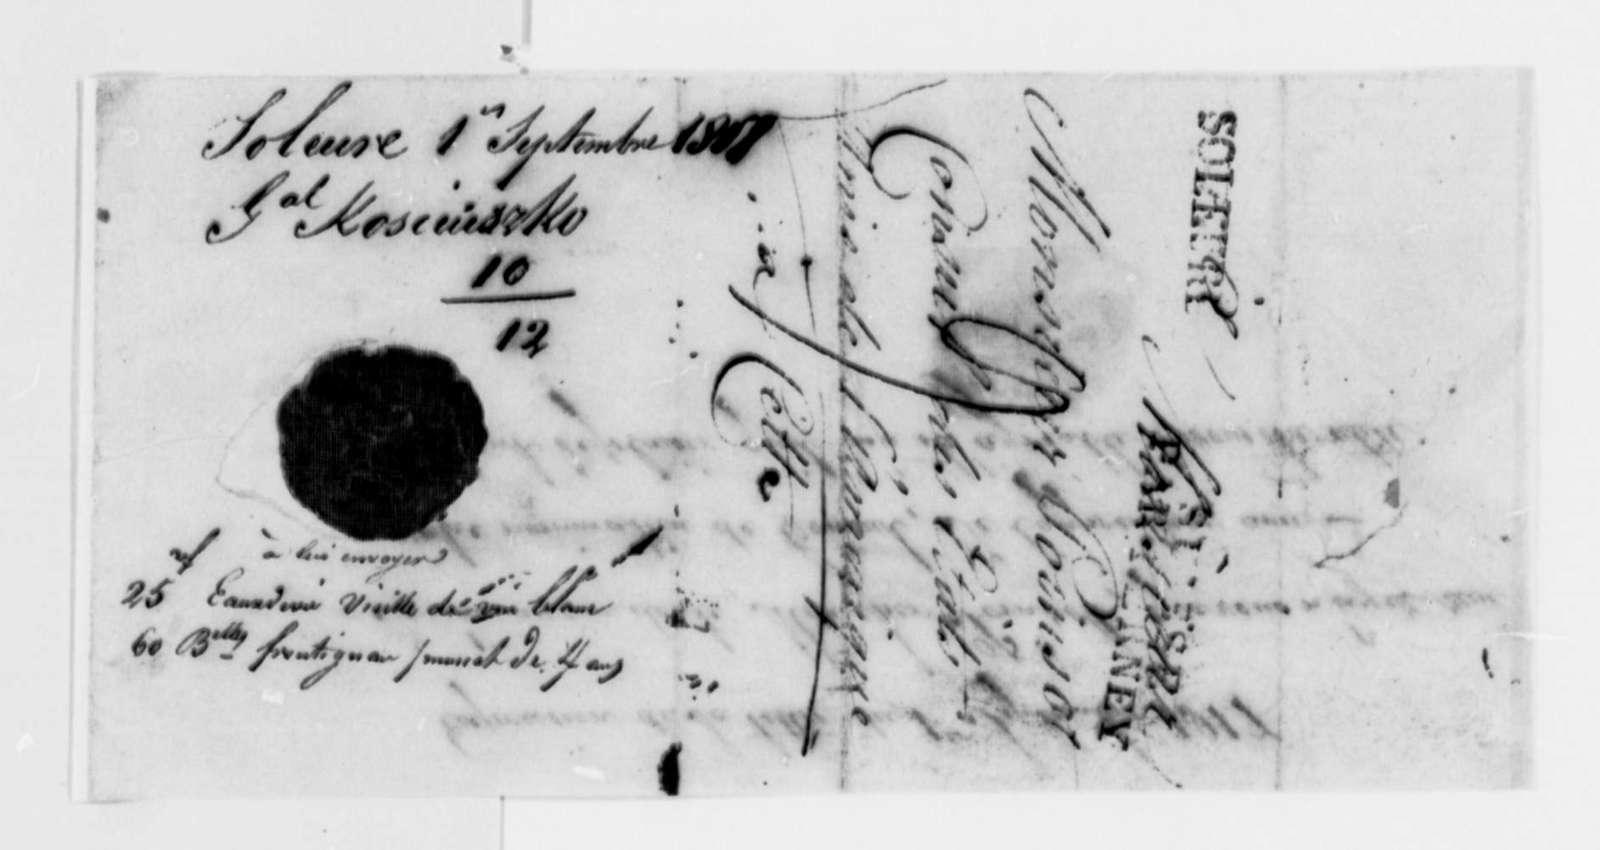 Thaddeus Kosciuszko to Pierre P. des Essarts, September 1, 1817